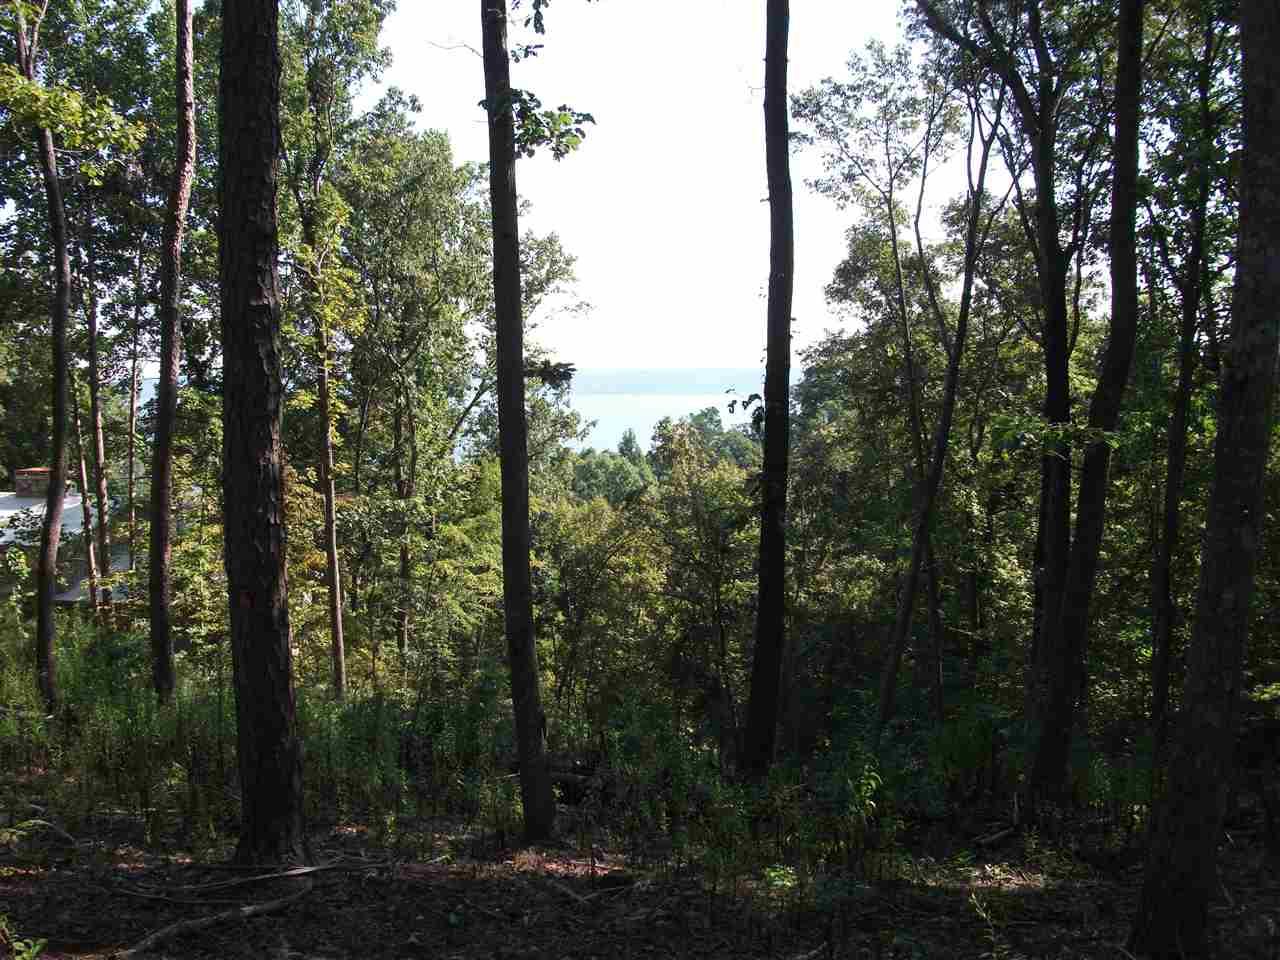 0 Island View Dr./Cbc Lane Counce, TN 38326 - MLS #: 10021070